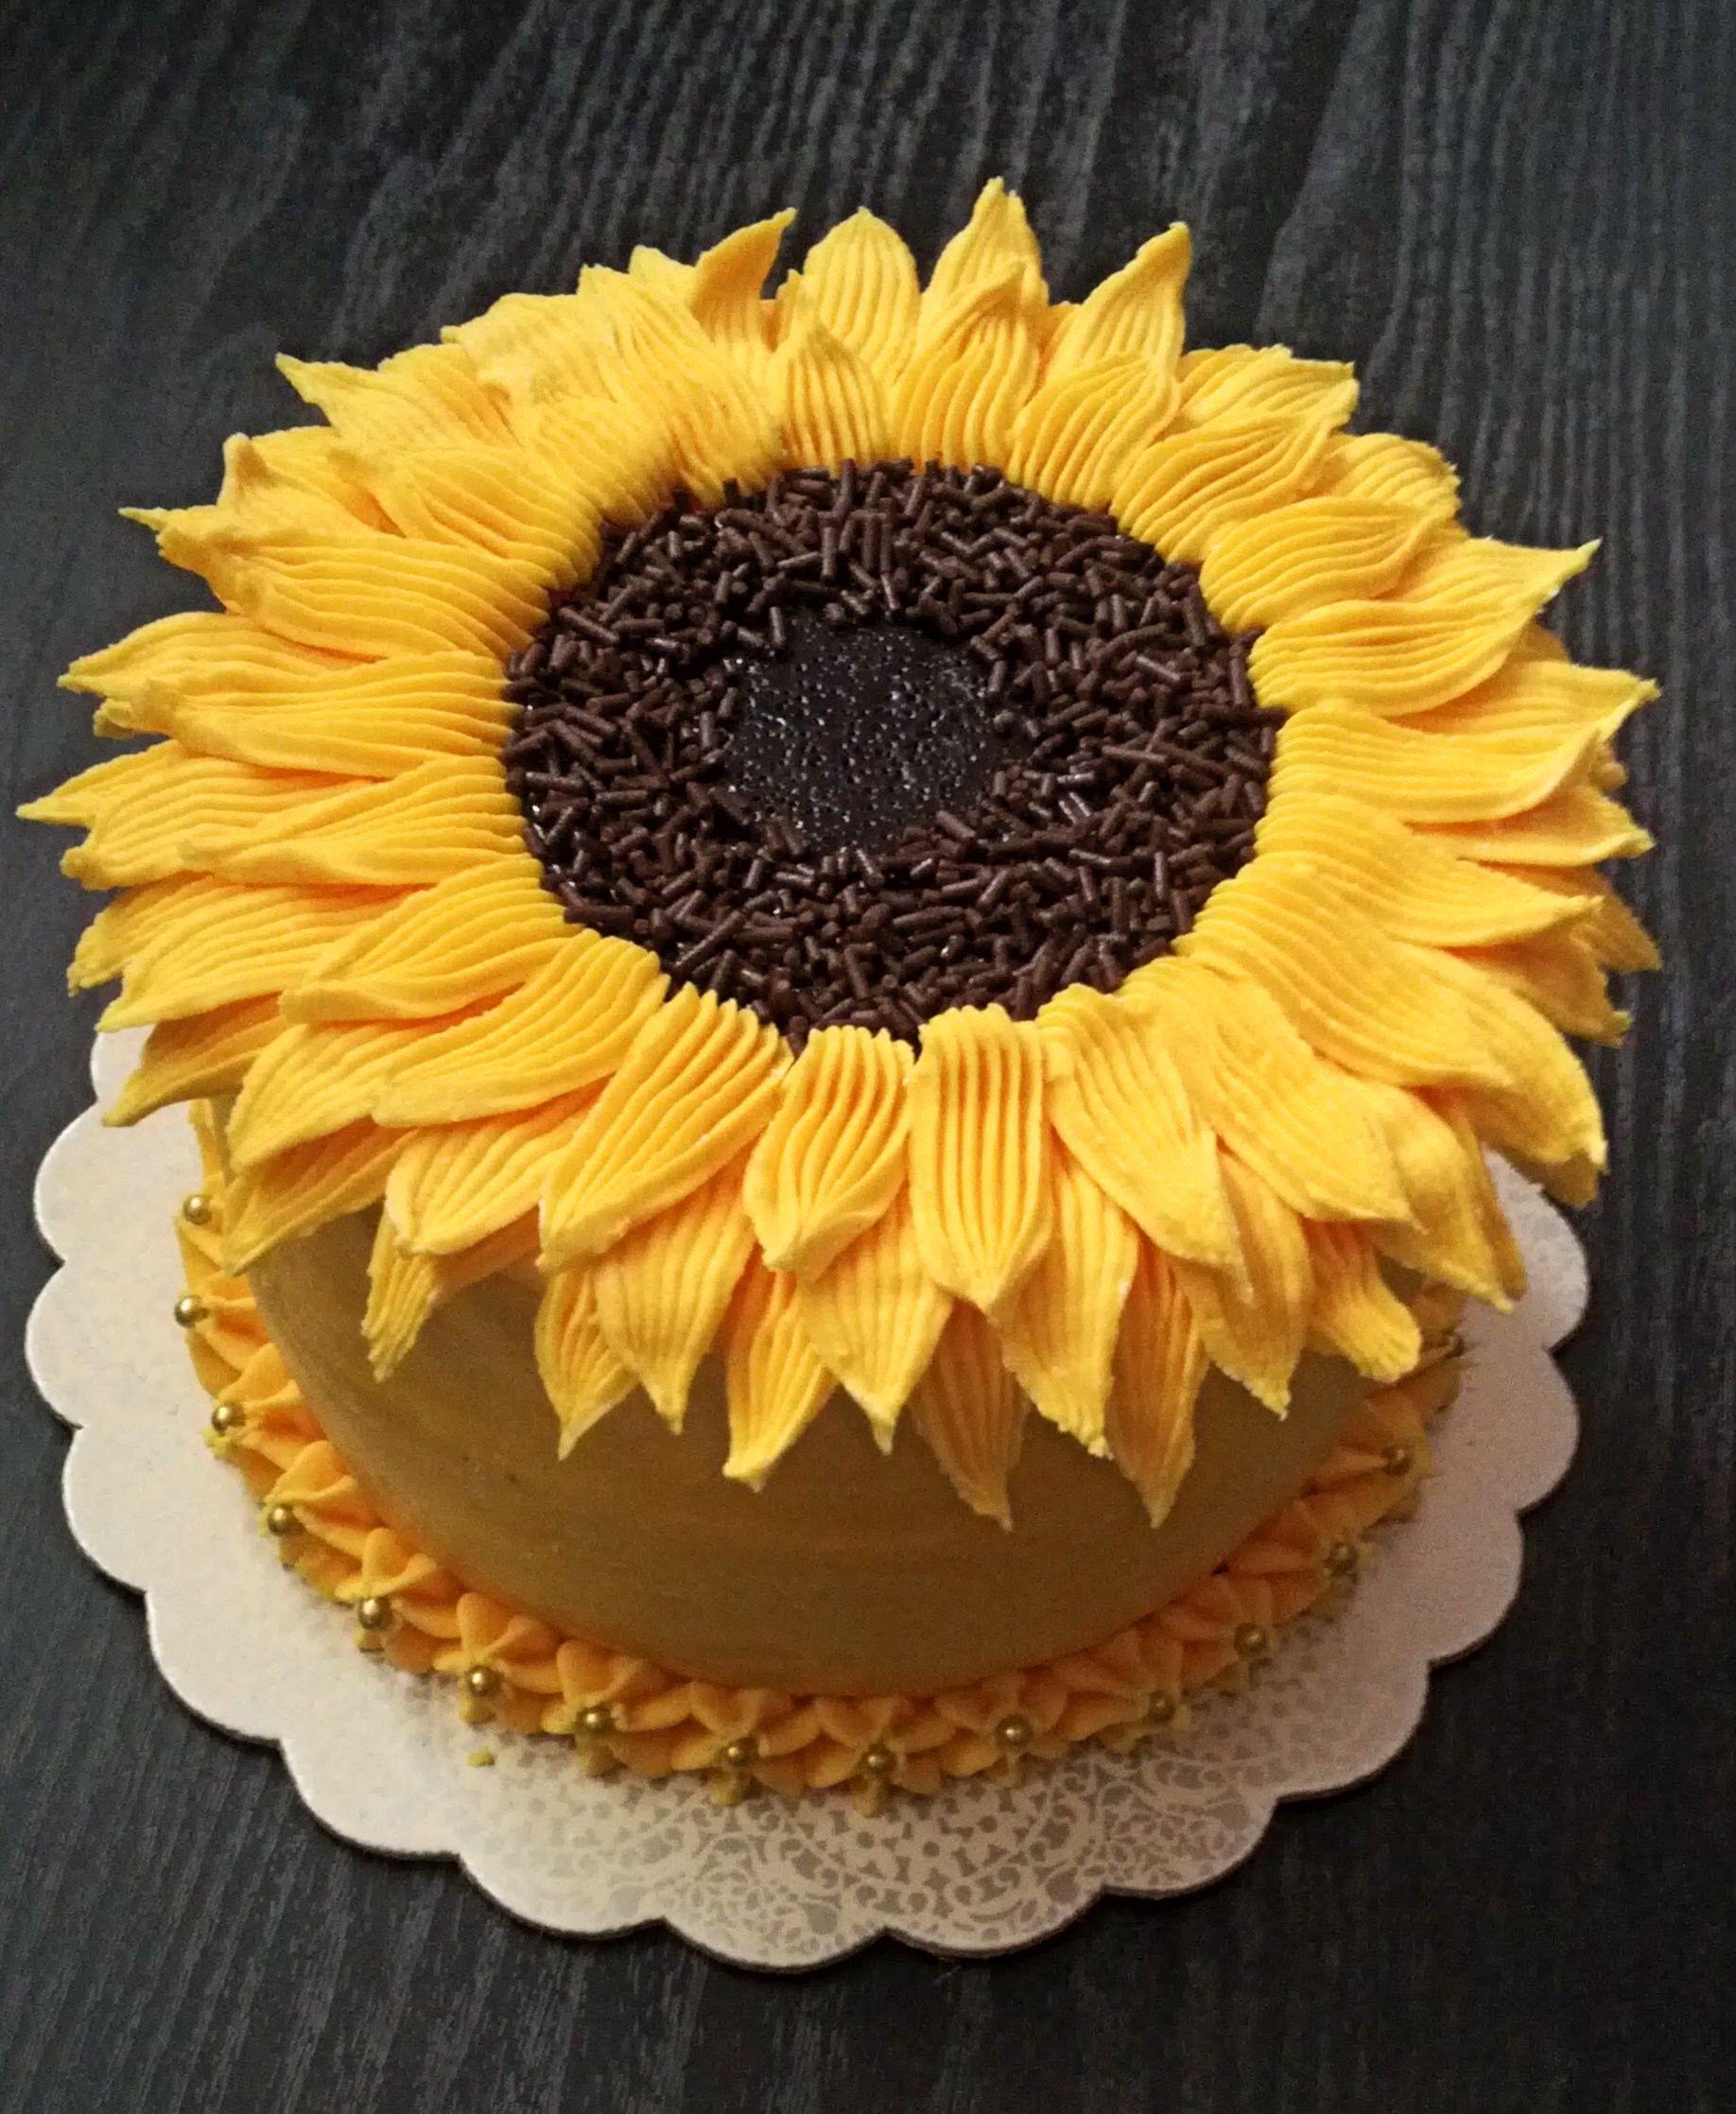 Pretty, sunflower cake design | Sunflower birthday cakes ...